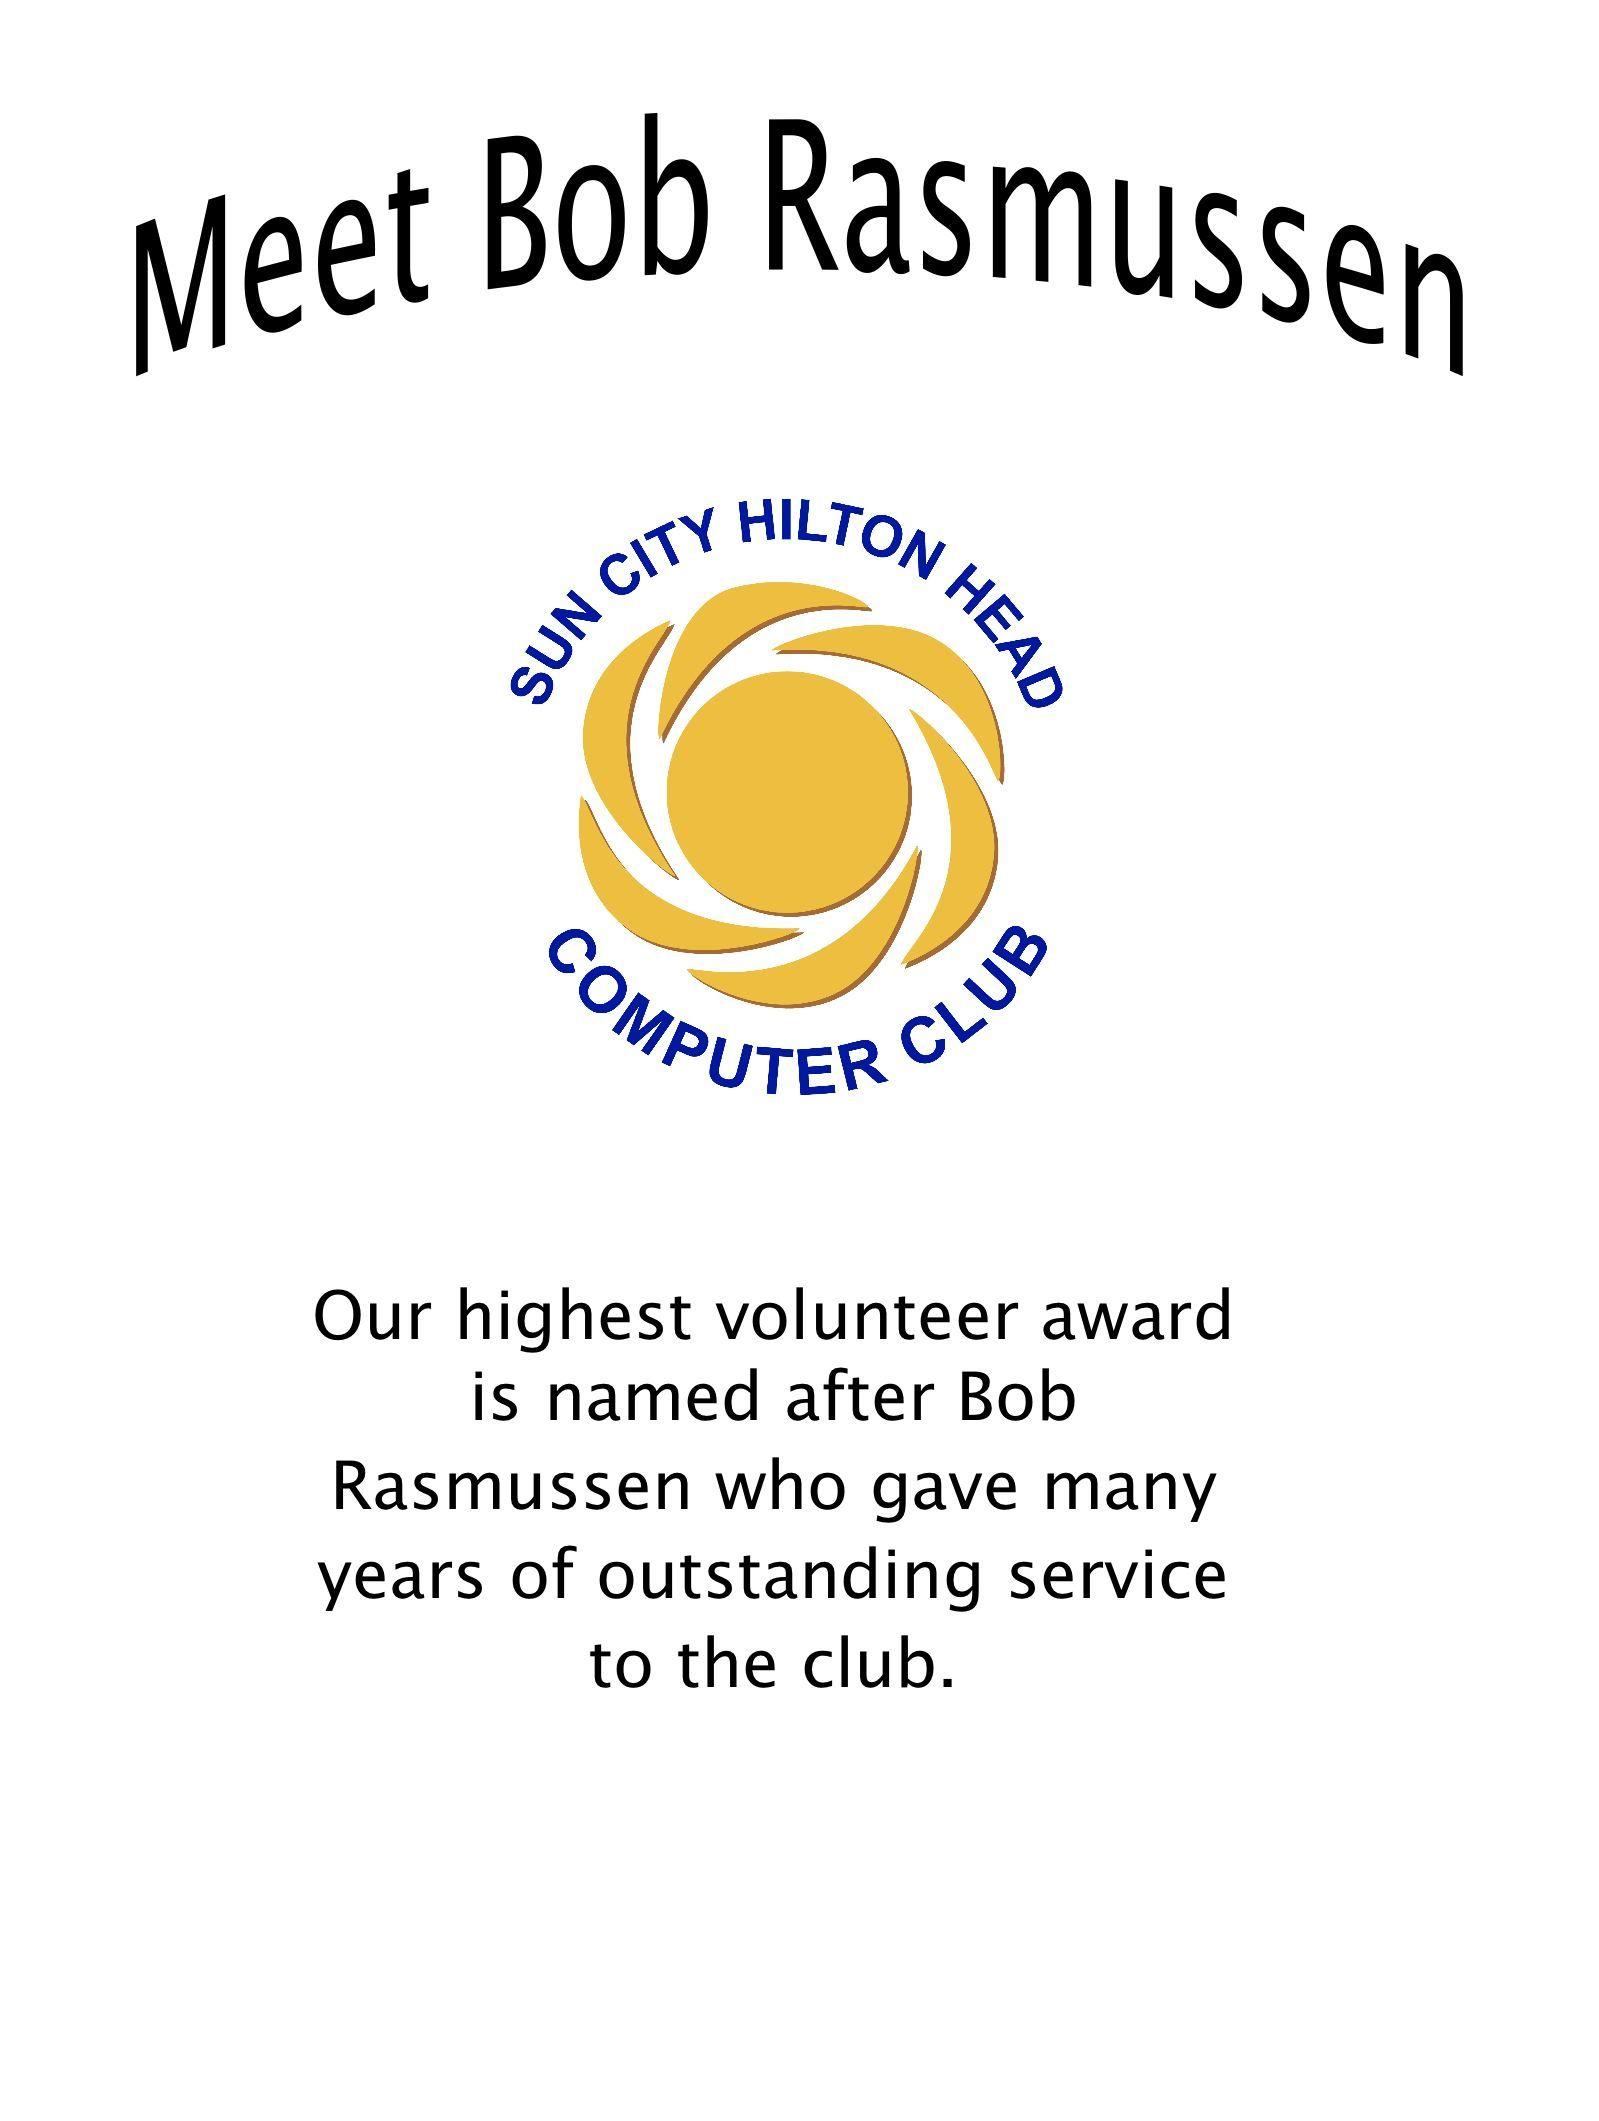 03-Meet Bob Rasmussen